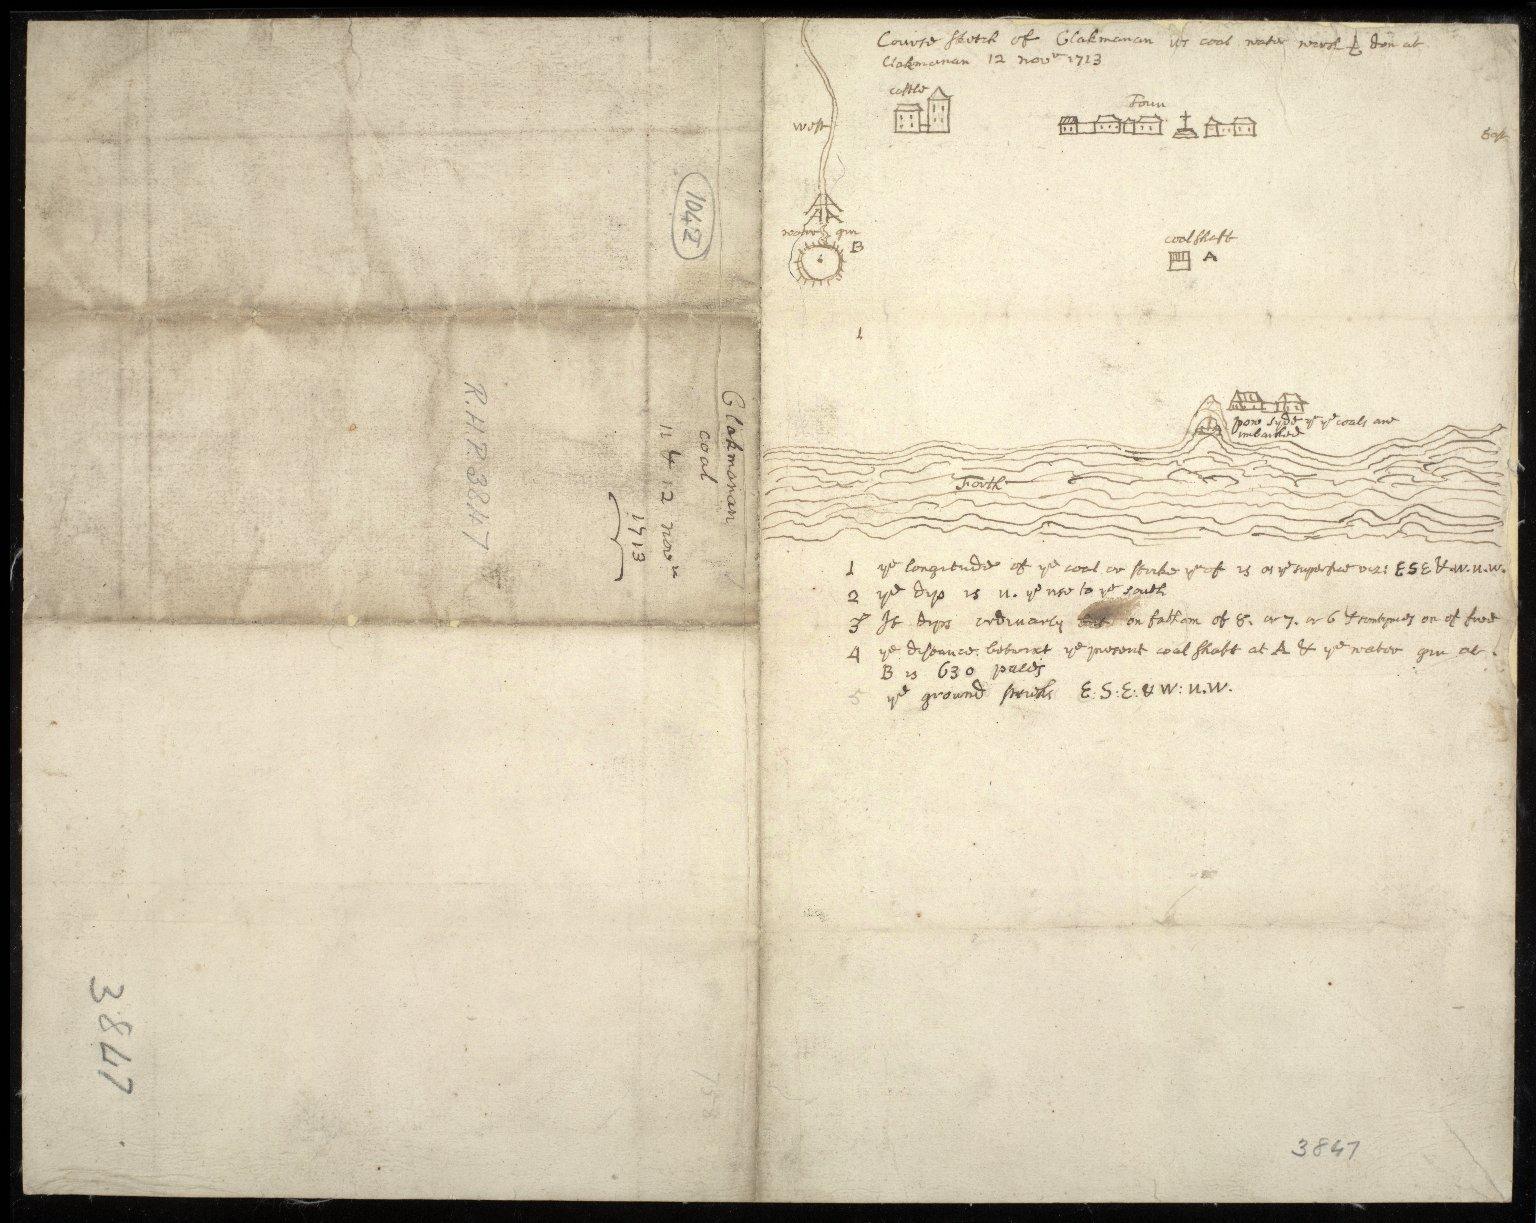 Clakmanan coal 11 & 12 novr 1713 [1 of 1]